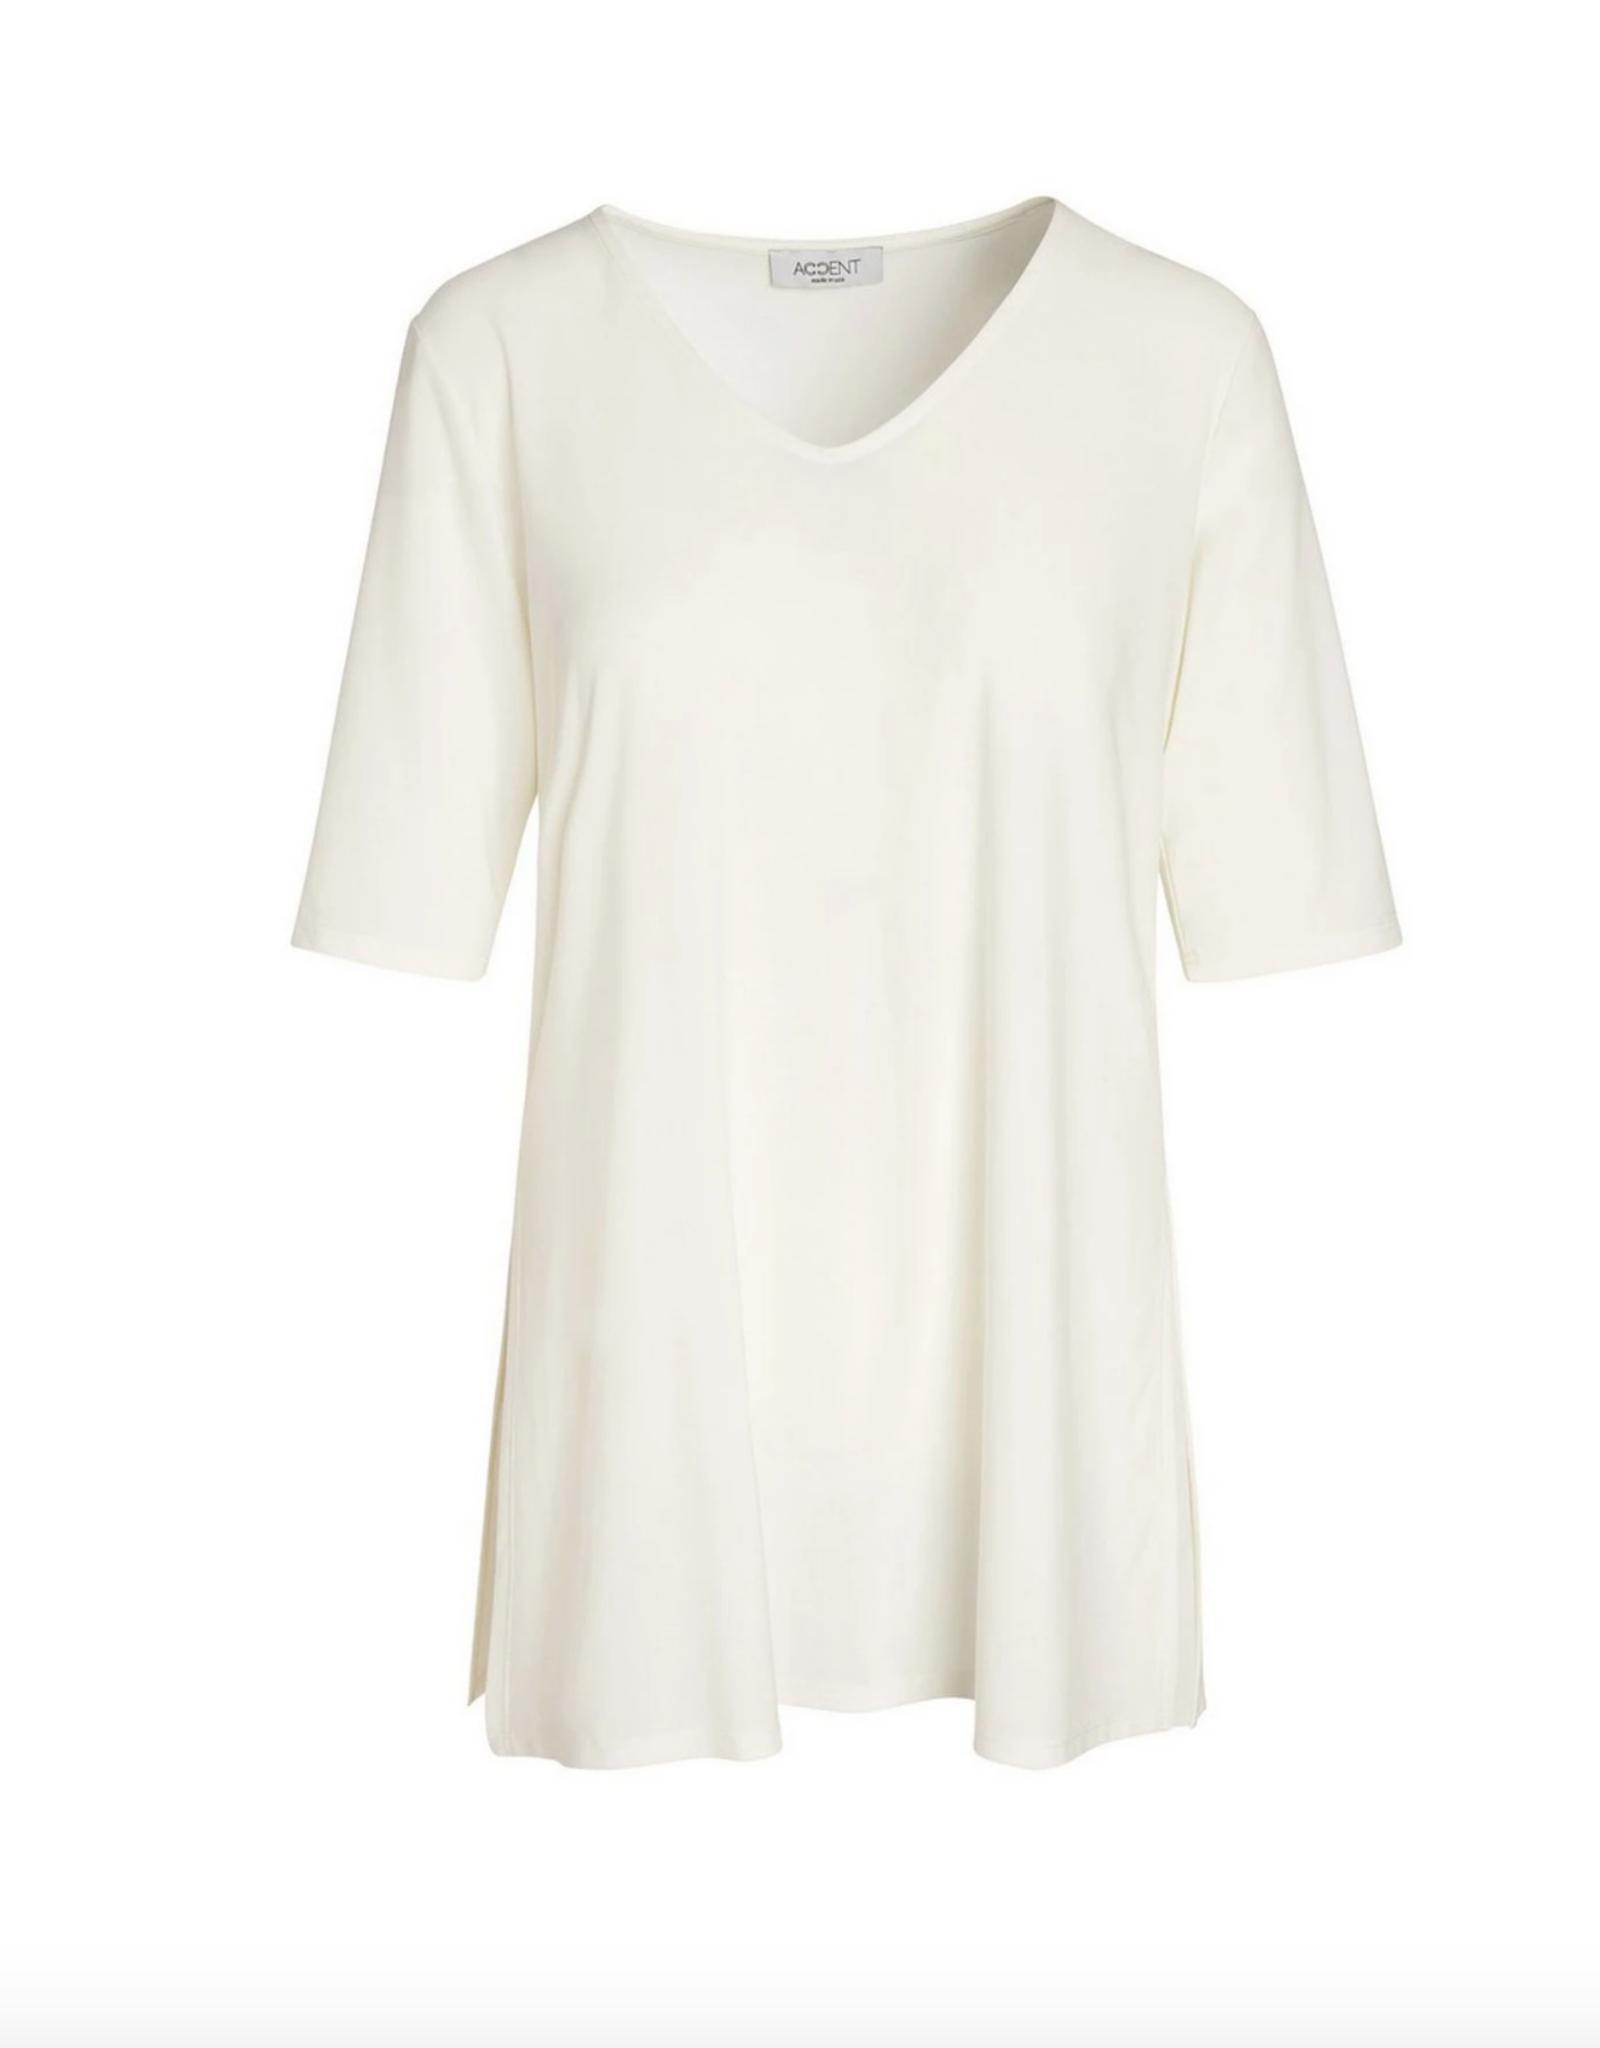 Accent - Magic Shirt Ivory